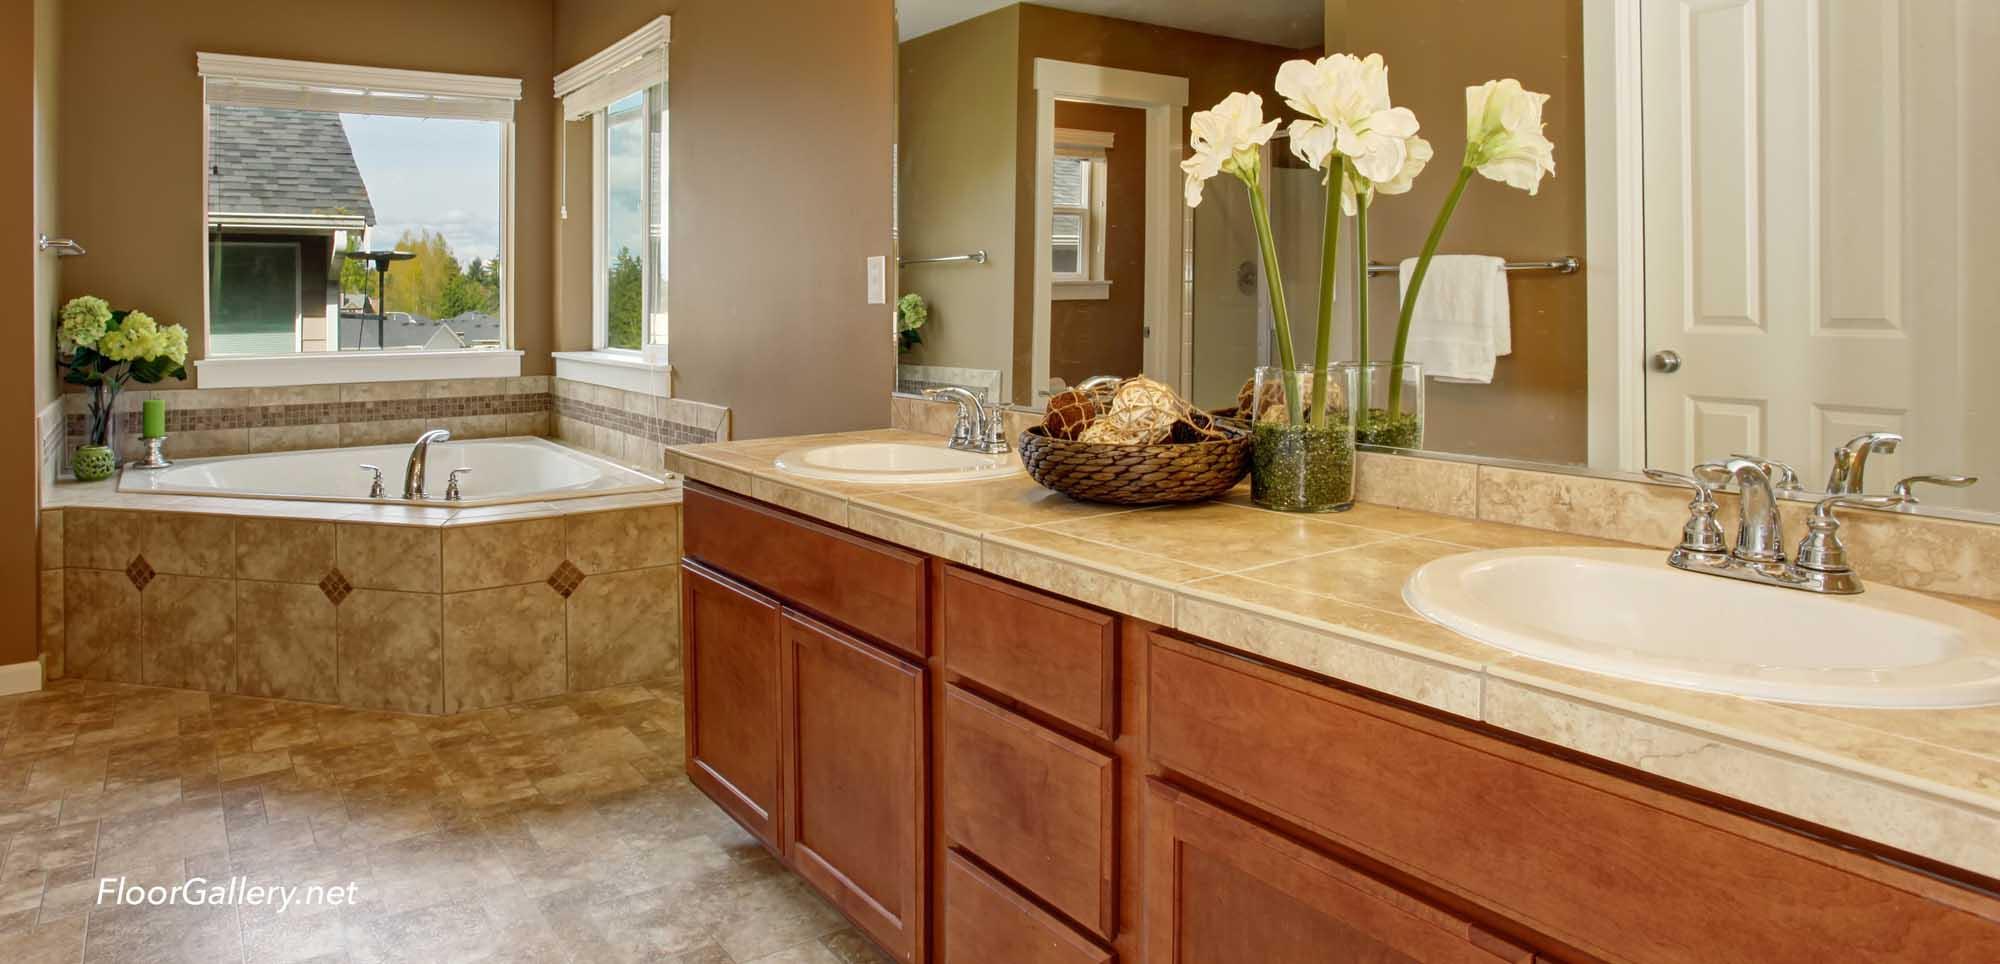 GALLERY Floor Gallery Kitchen Bath Flooring In Mission Viejo - Mission viejo bathroom remodeling